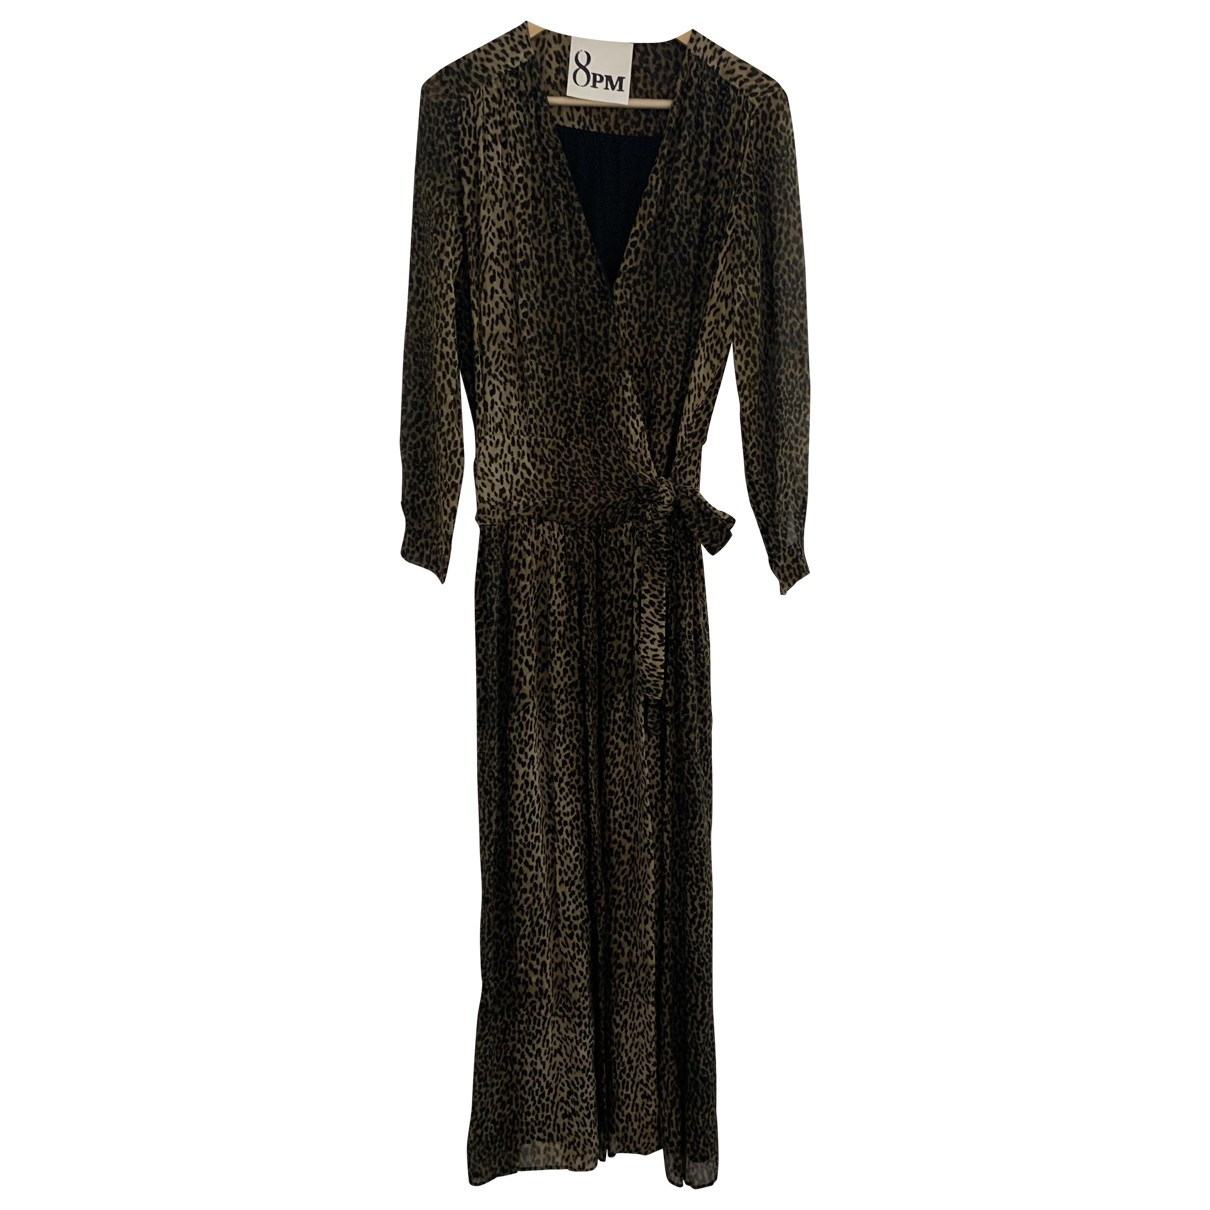 8pm \N Brown dress for Women XS International